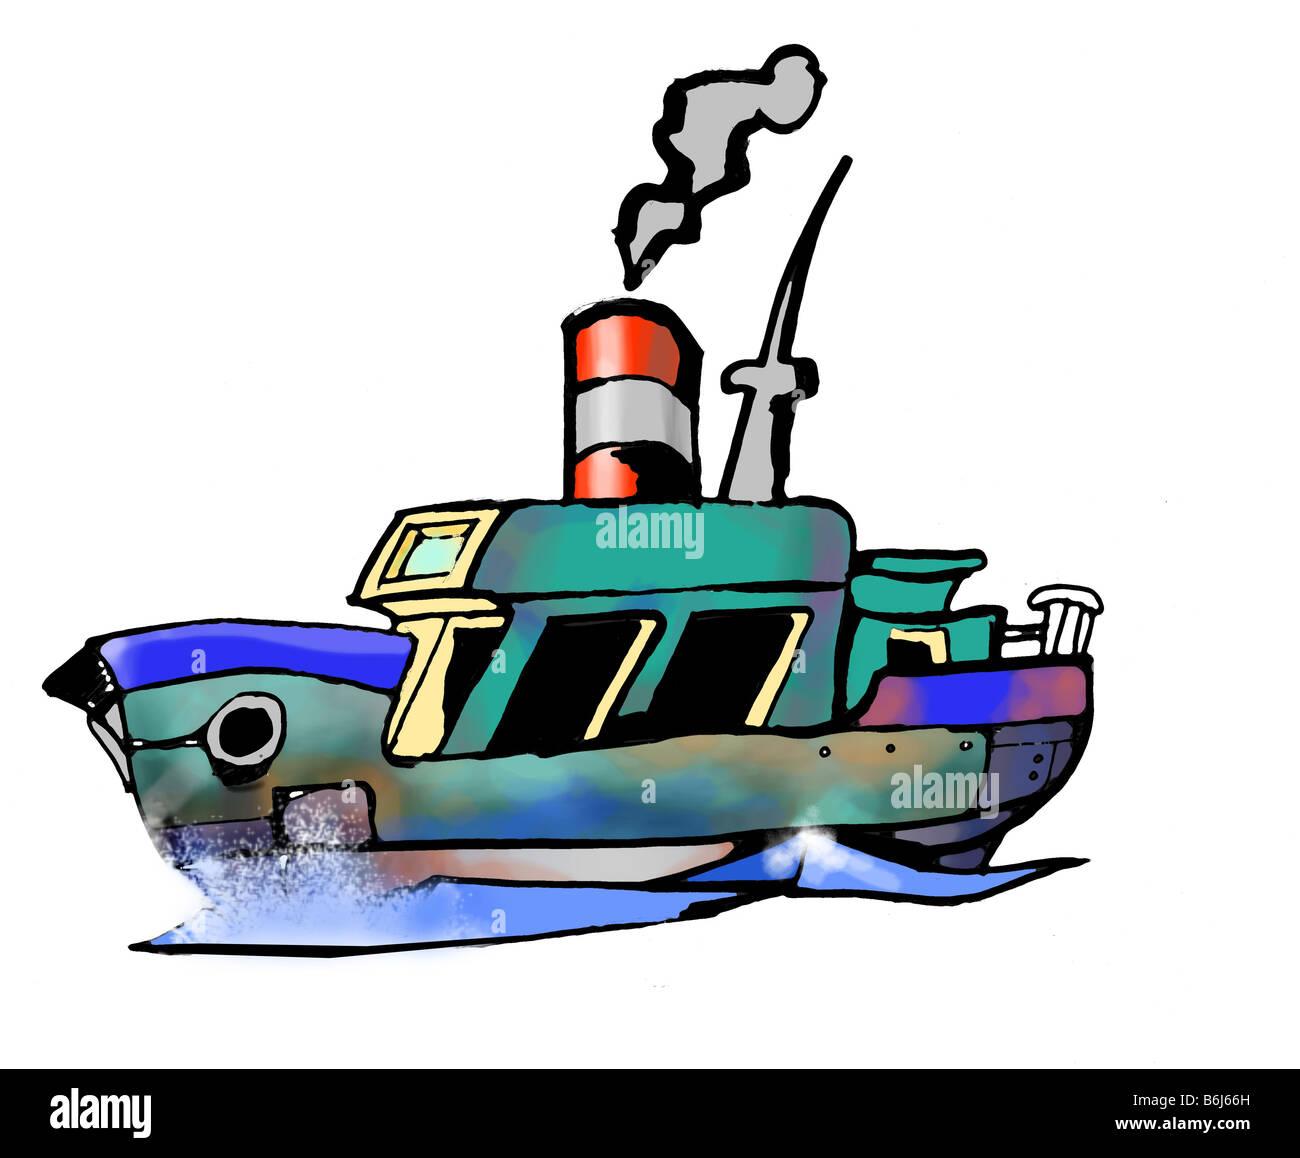 Ship sailing - Stock Image